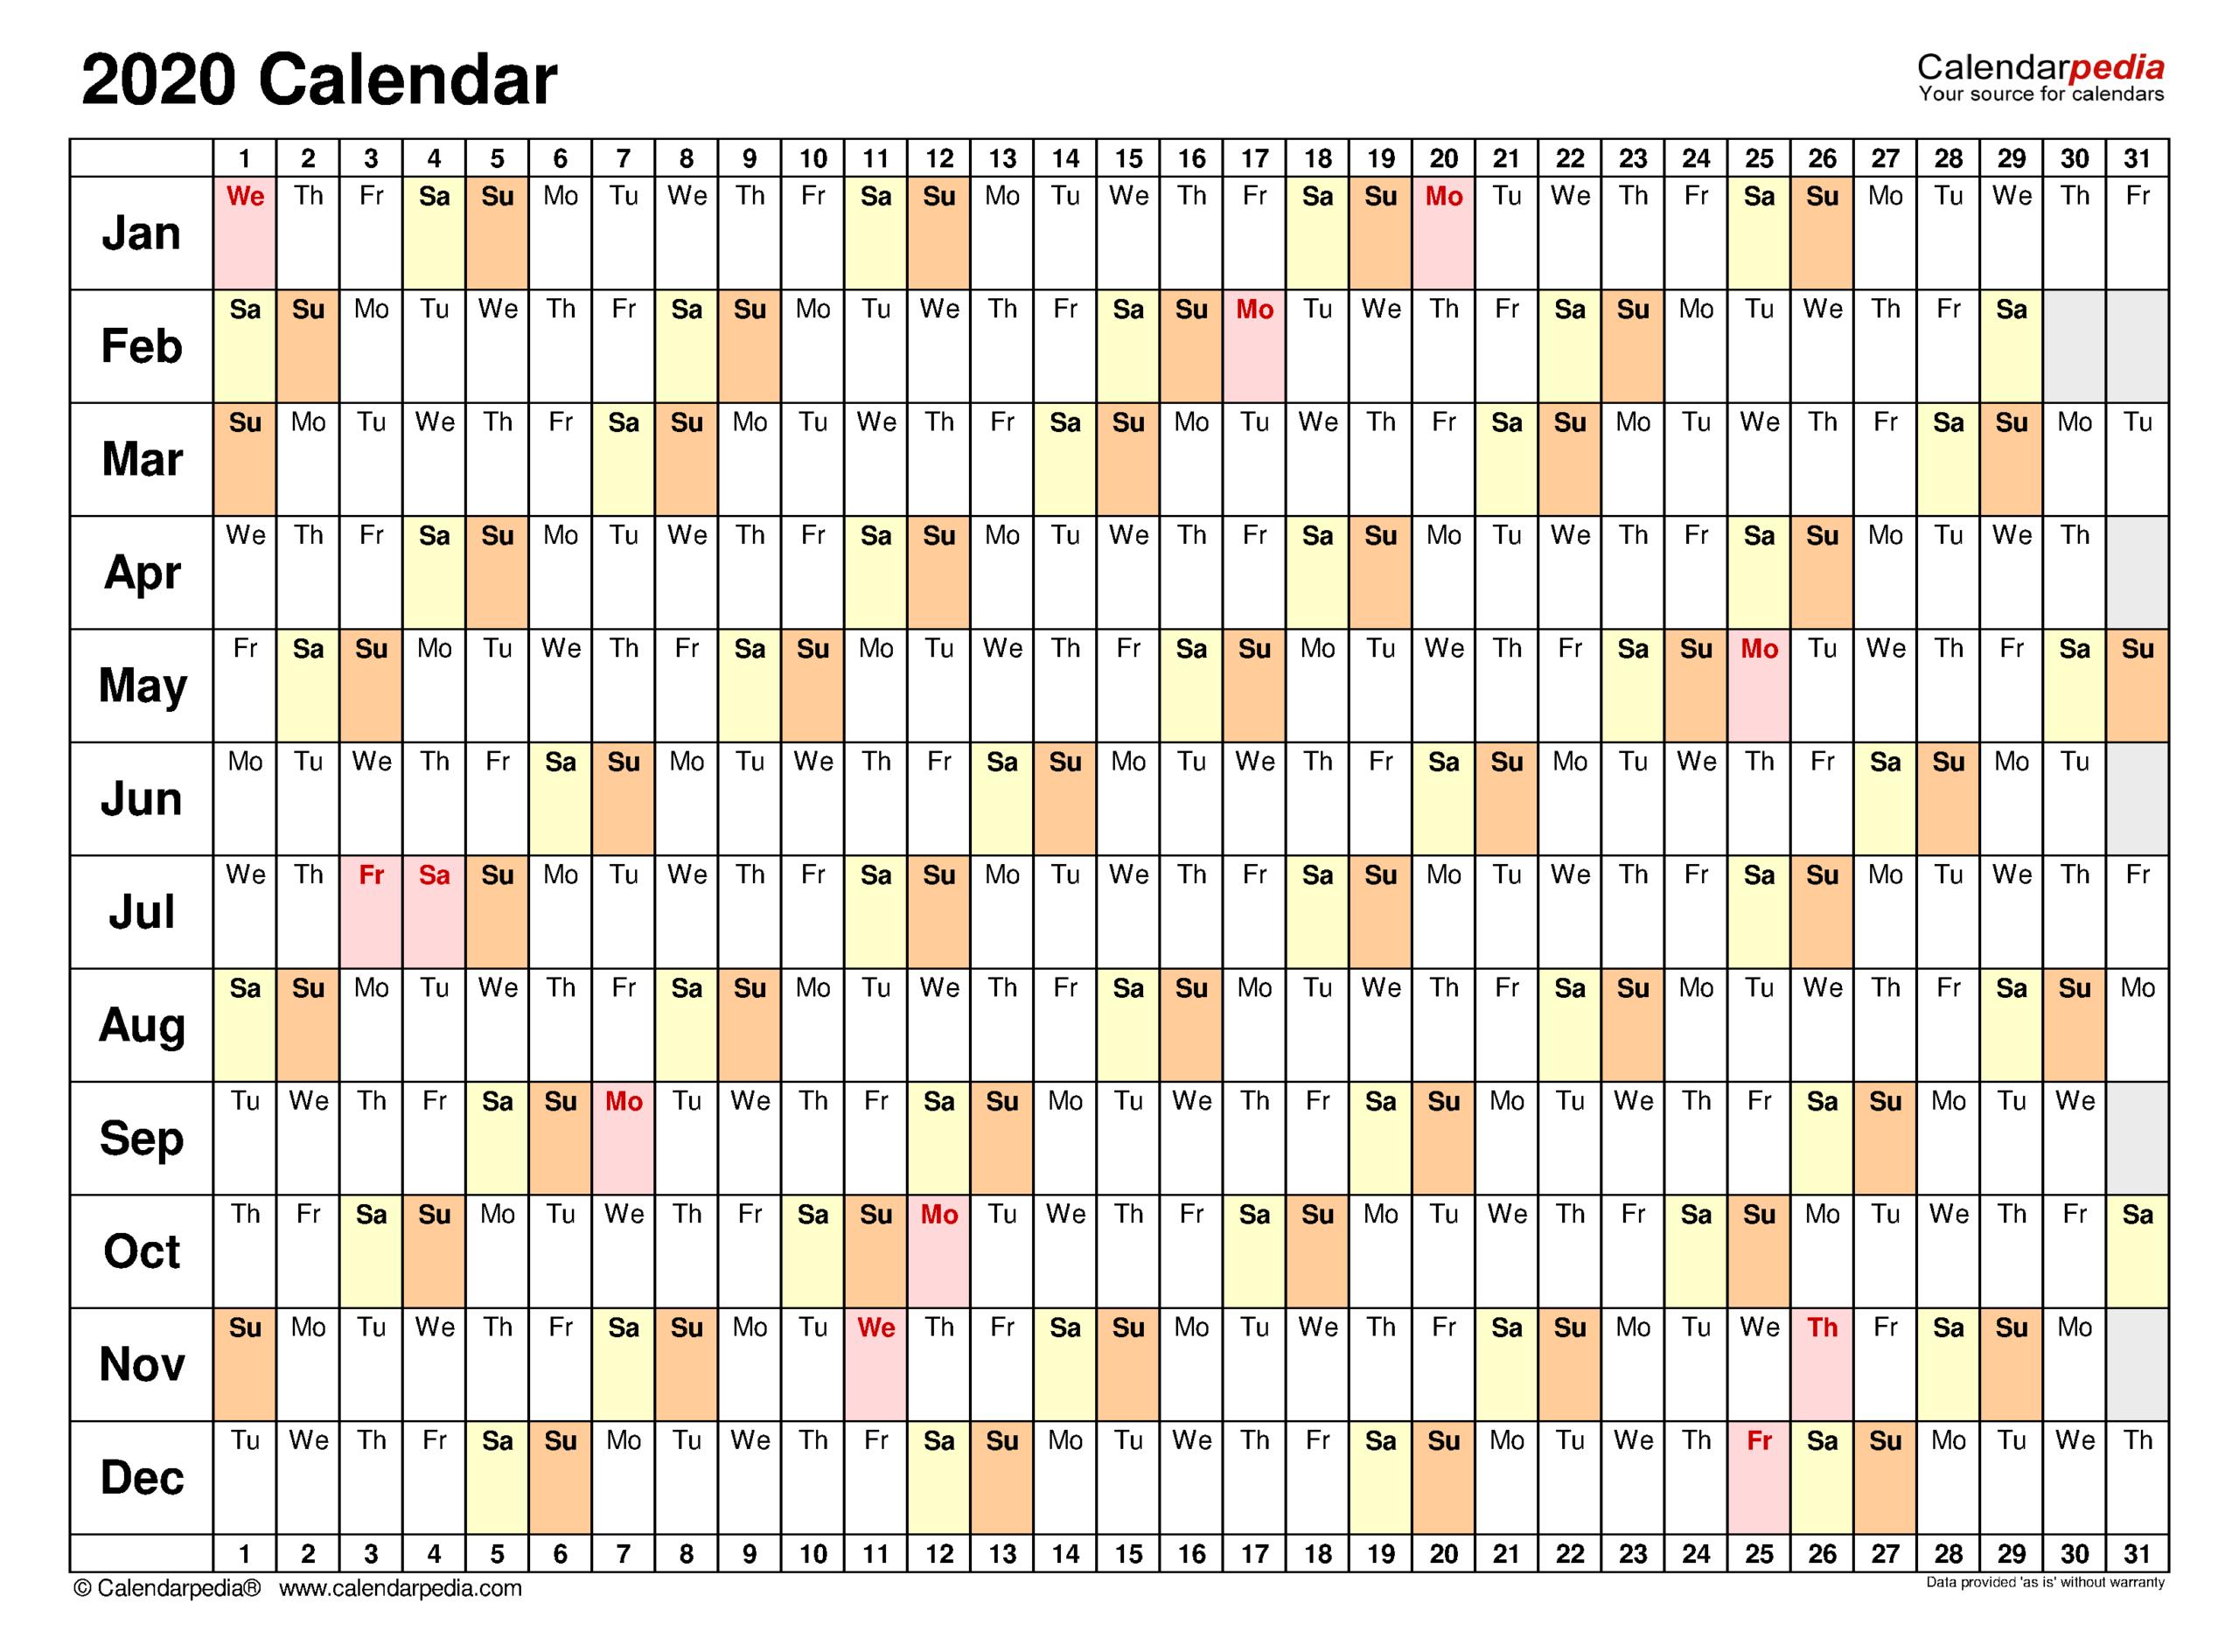 التقويم الهجري والميلادي 2020 Calendar Aramco within Aramco Calendar 2021